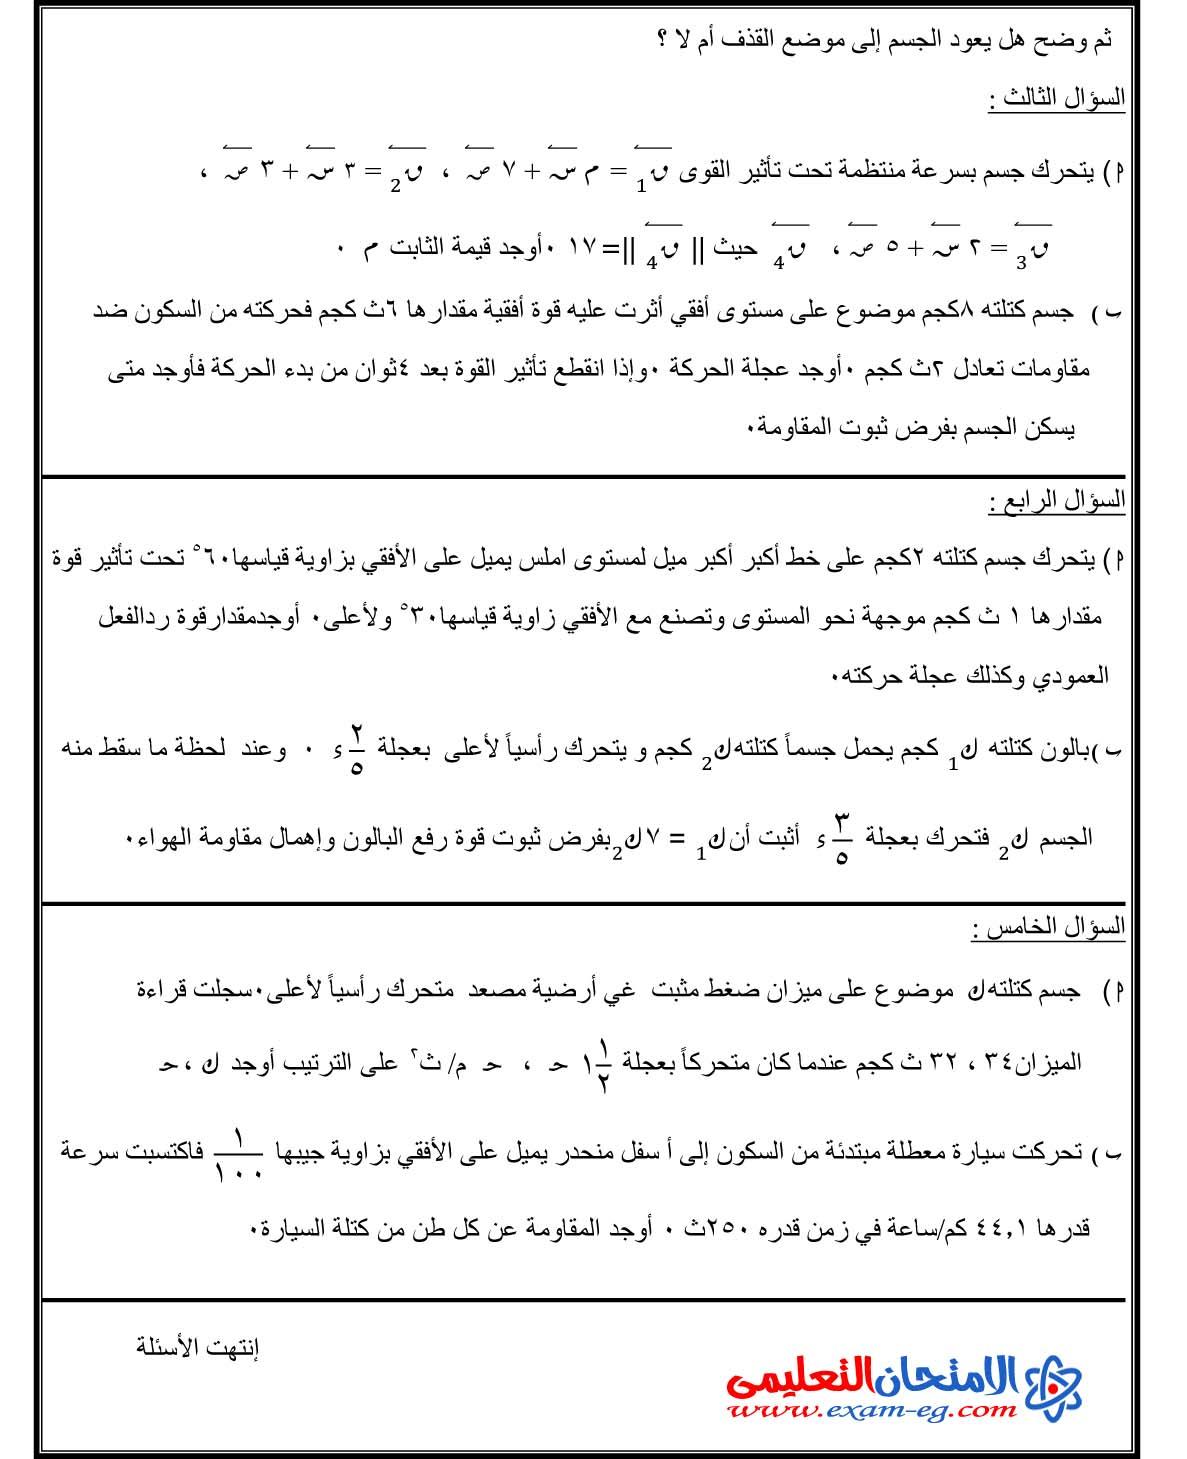 exam-eg.com_1460420680472.jpg